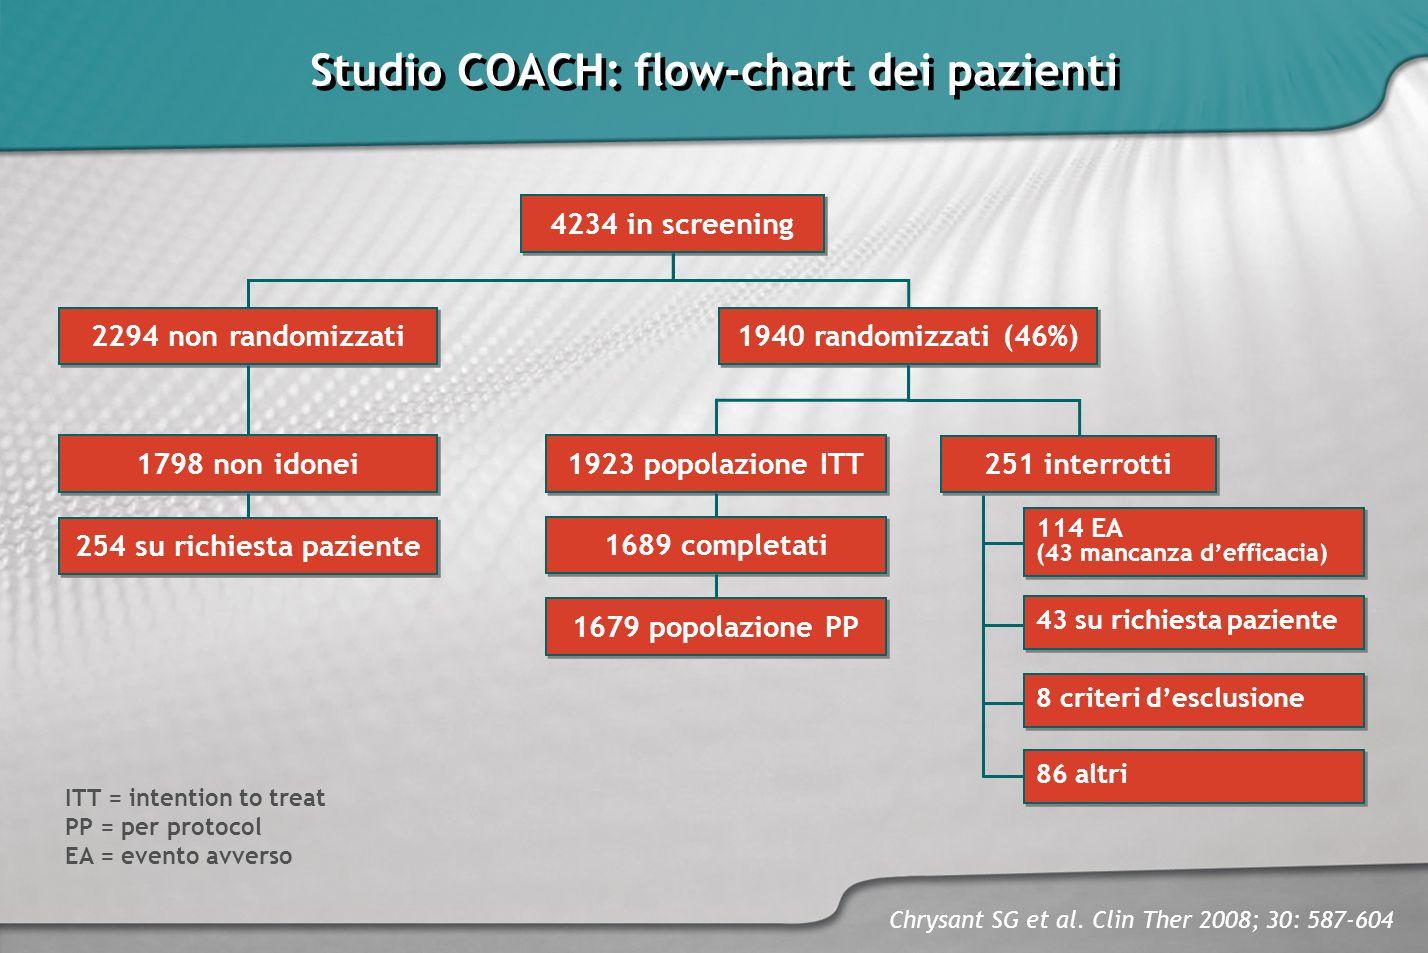 Studio COACH: flow-chart dei pazienti